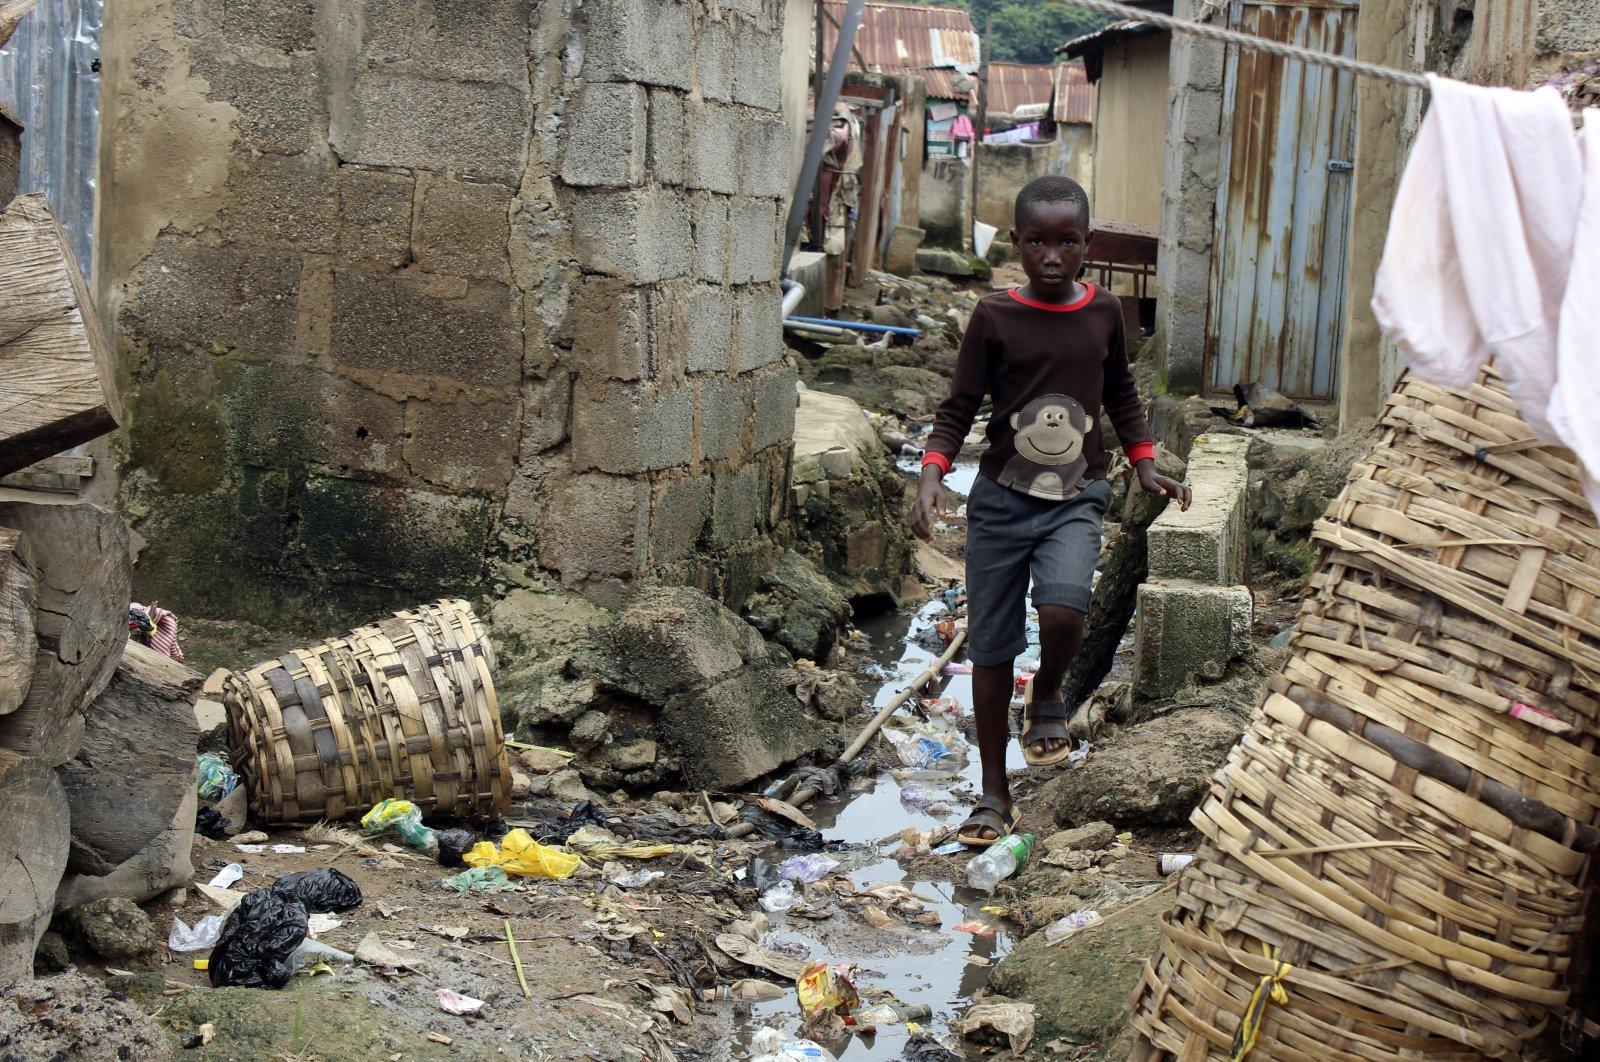 A boy walks past sewage around houses in Abuja, Nigeria, Sept. 3, 2021. (AP Photo)